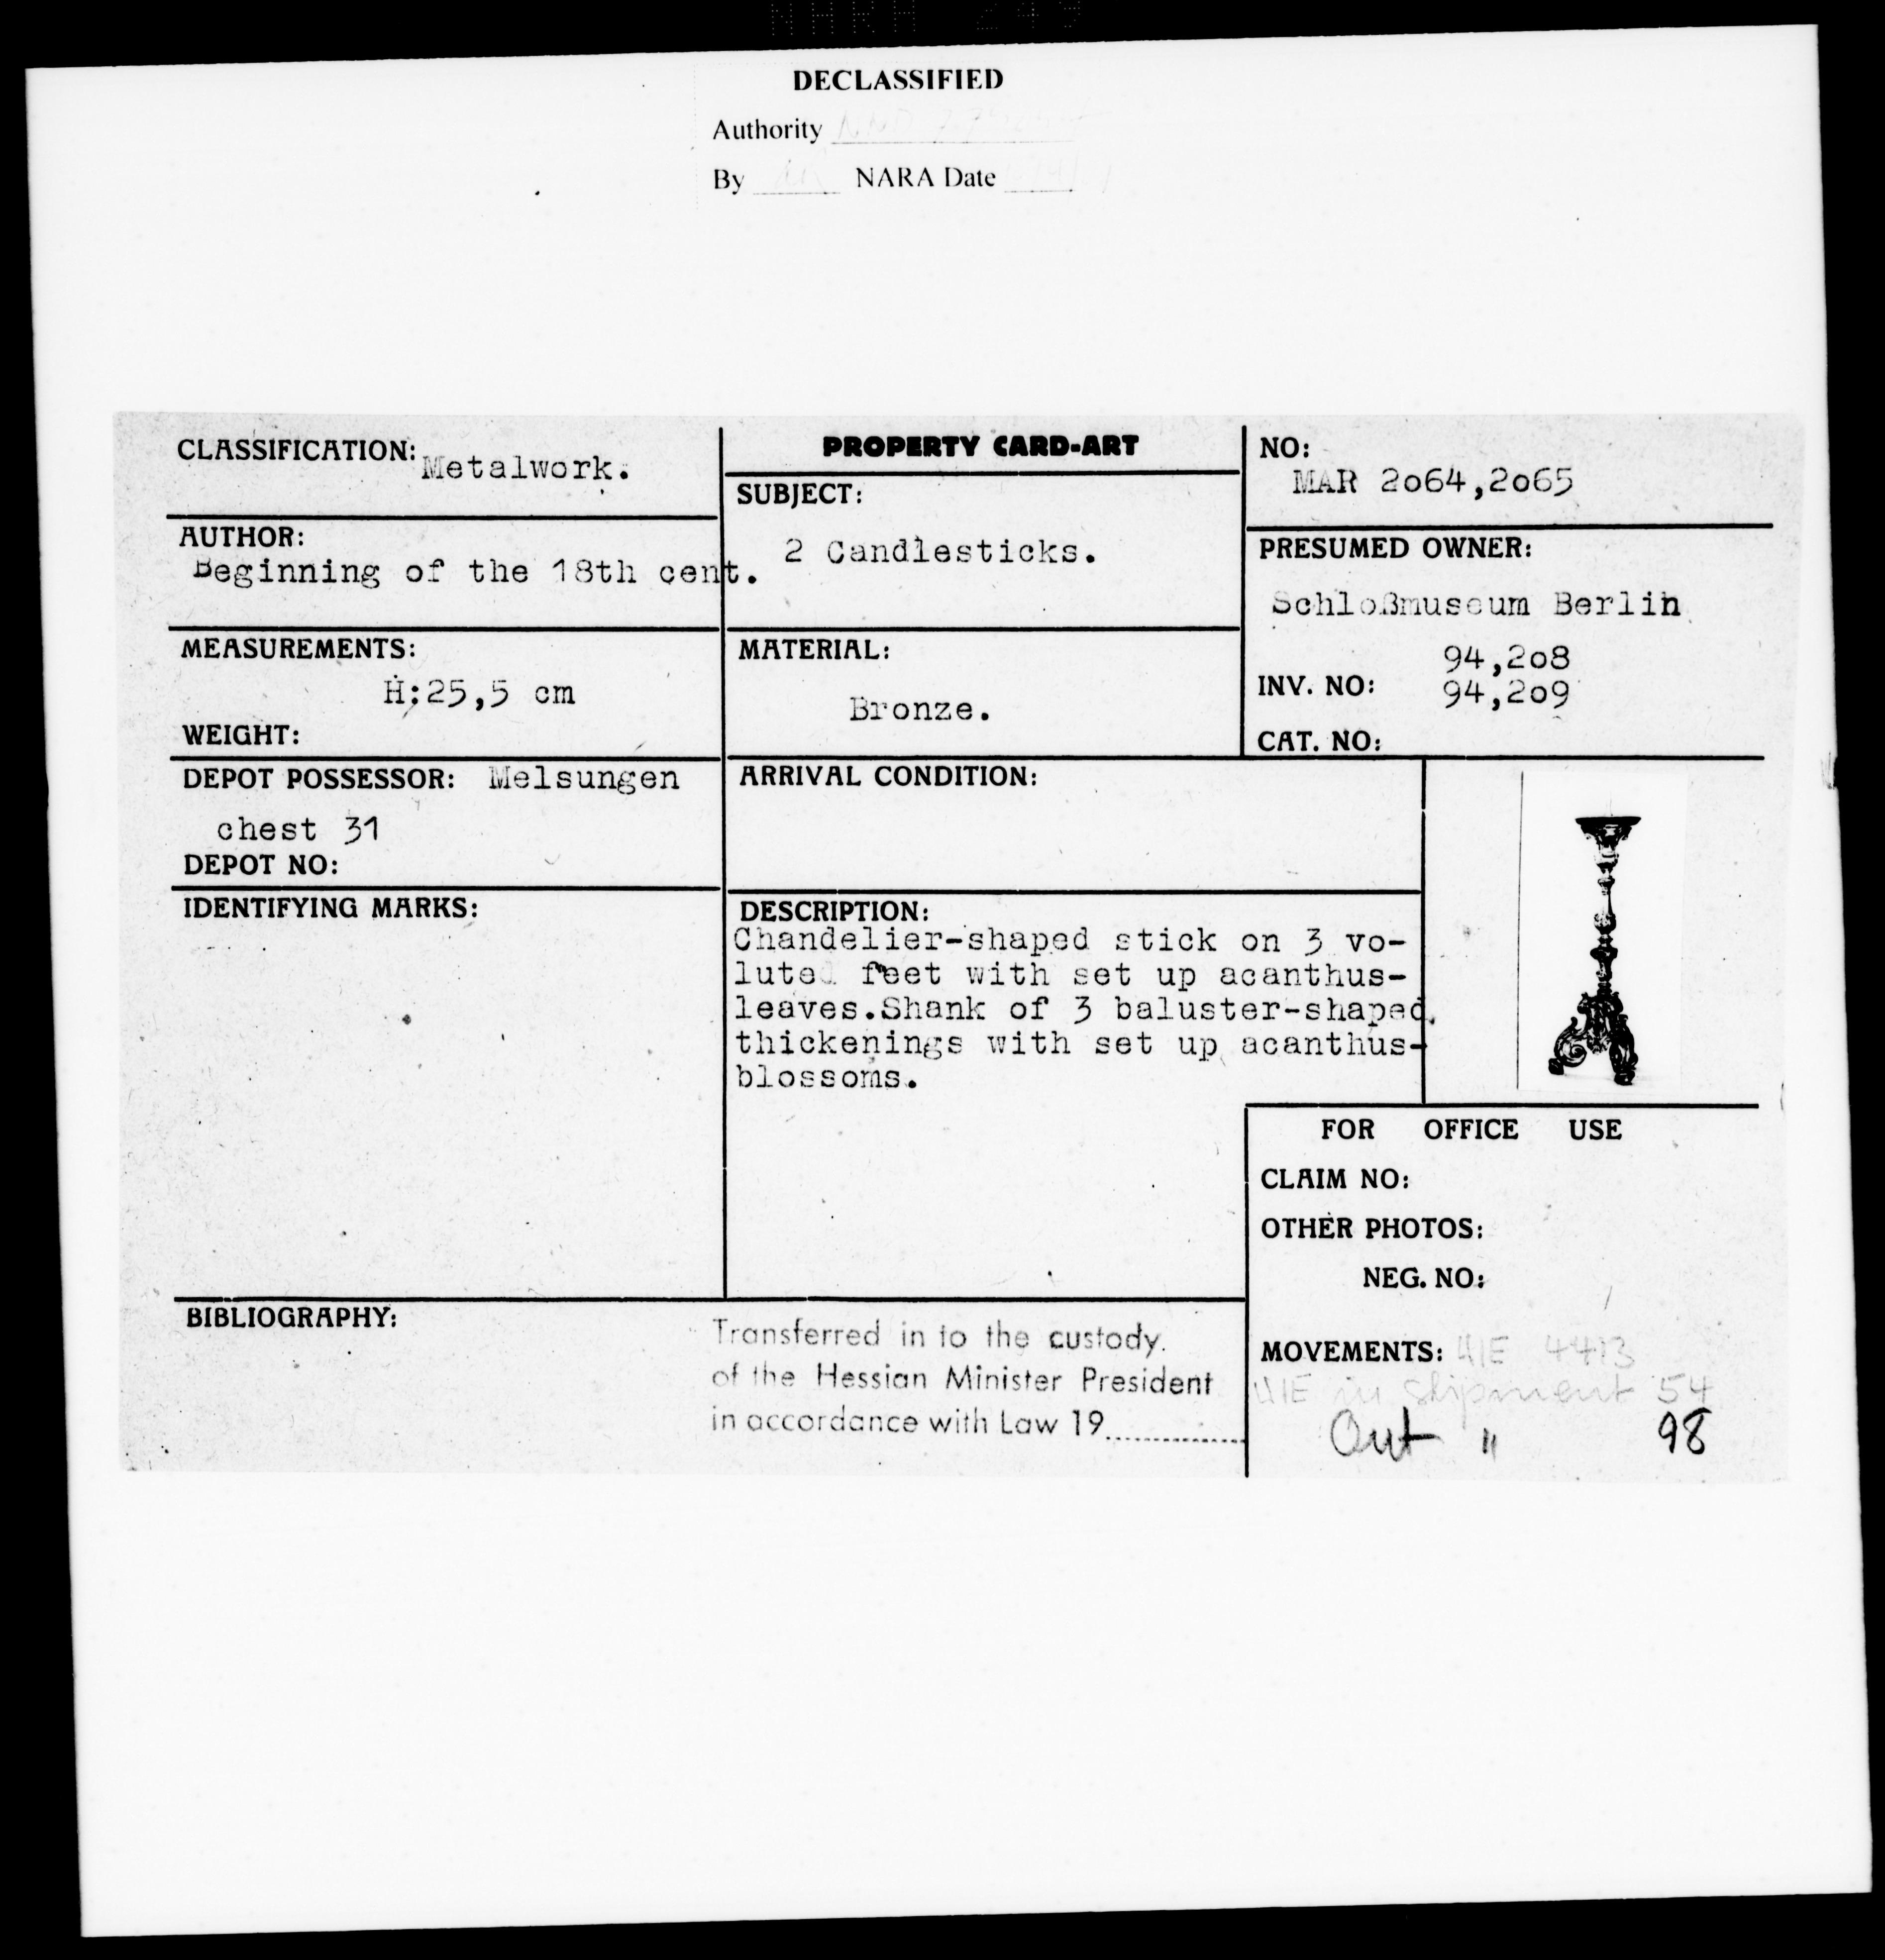 Property Card Mar 2065, Metalwork, 2 Candlesticks